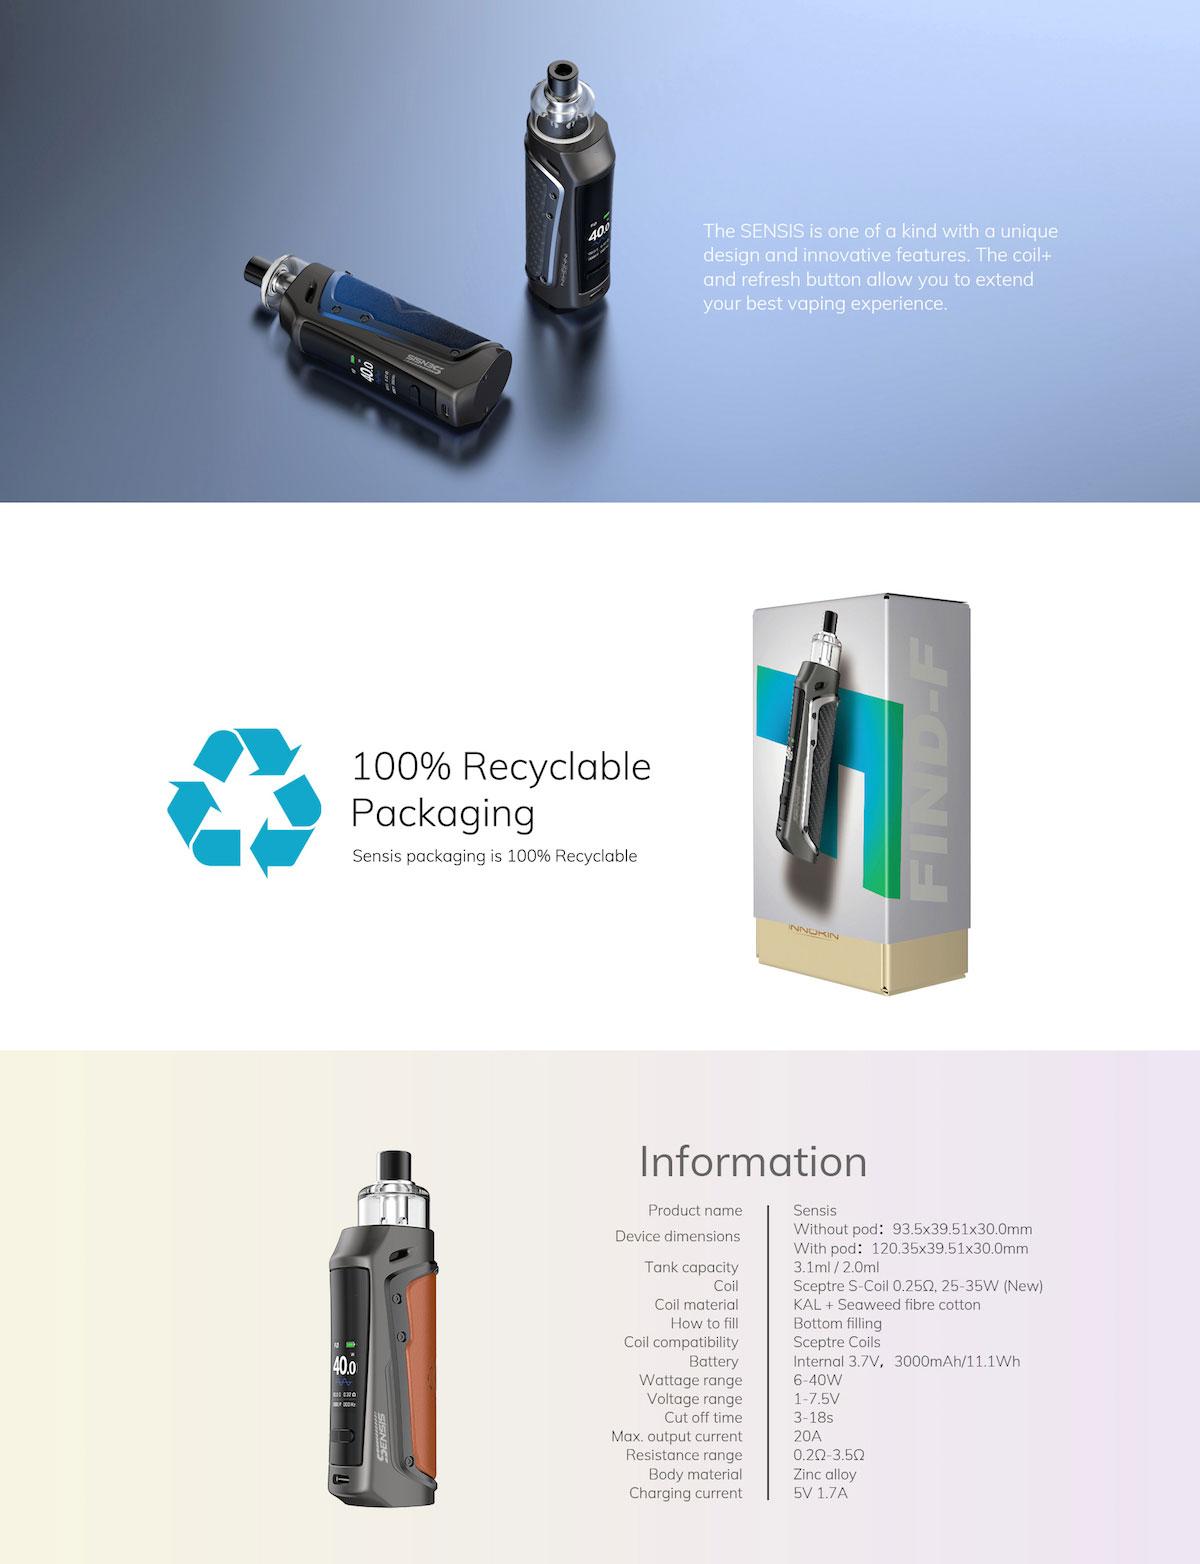 Sensis-product-page-4-web